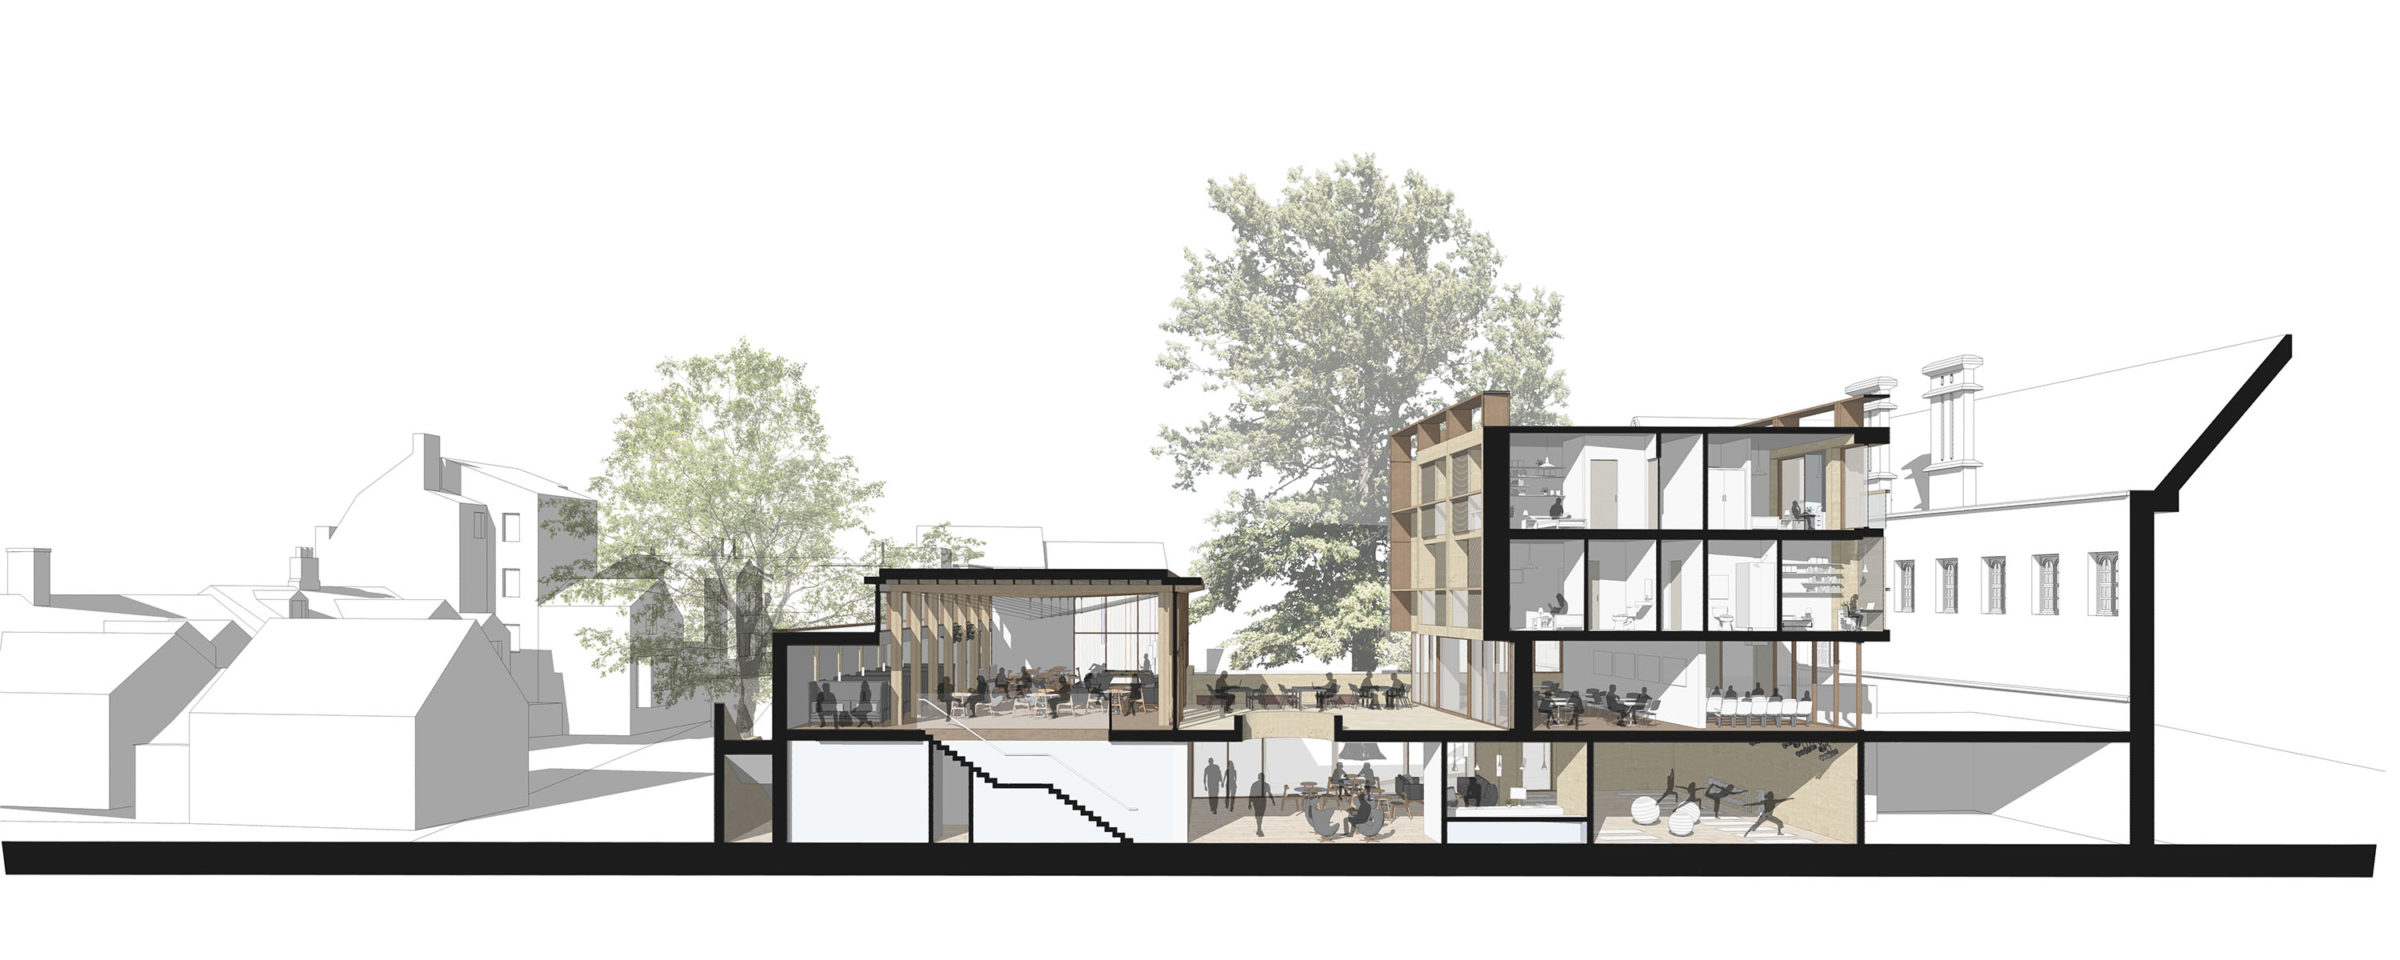 DesignEngine Wadham College Visualisation Section